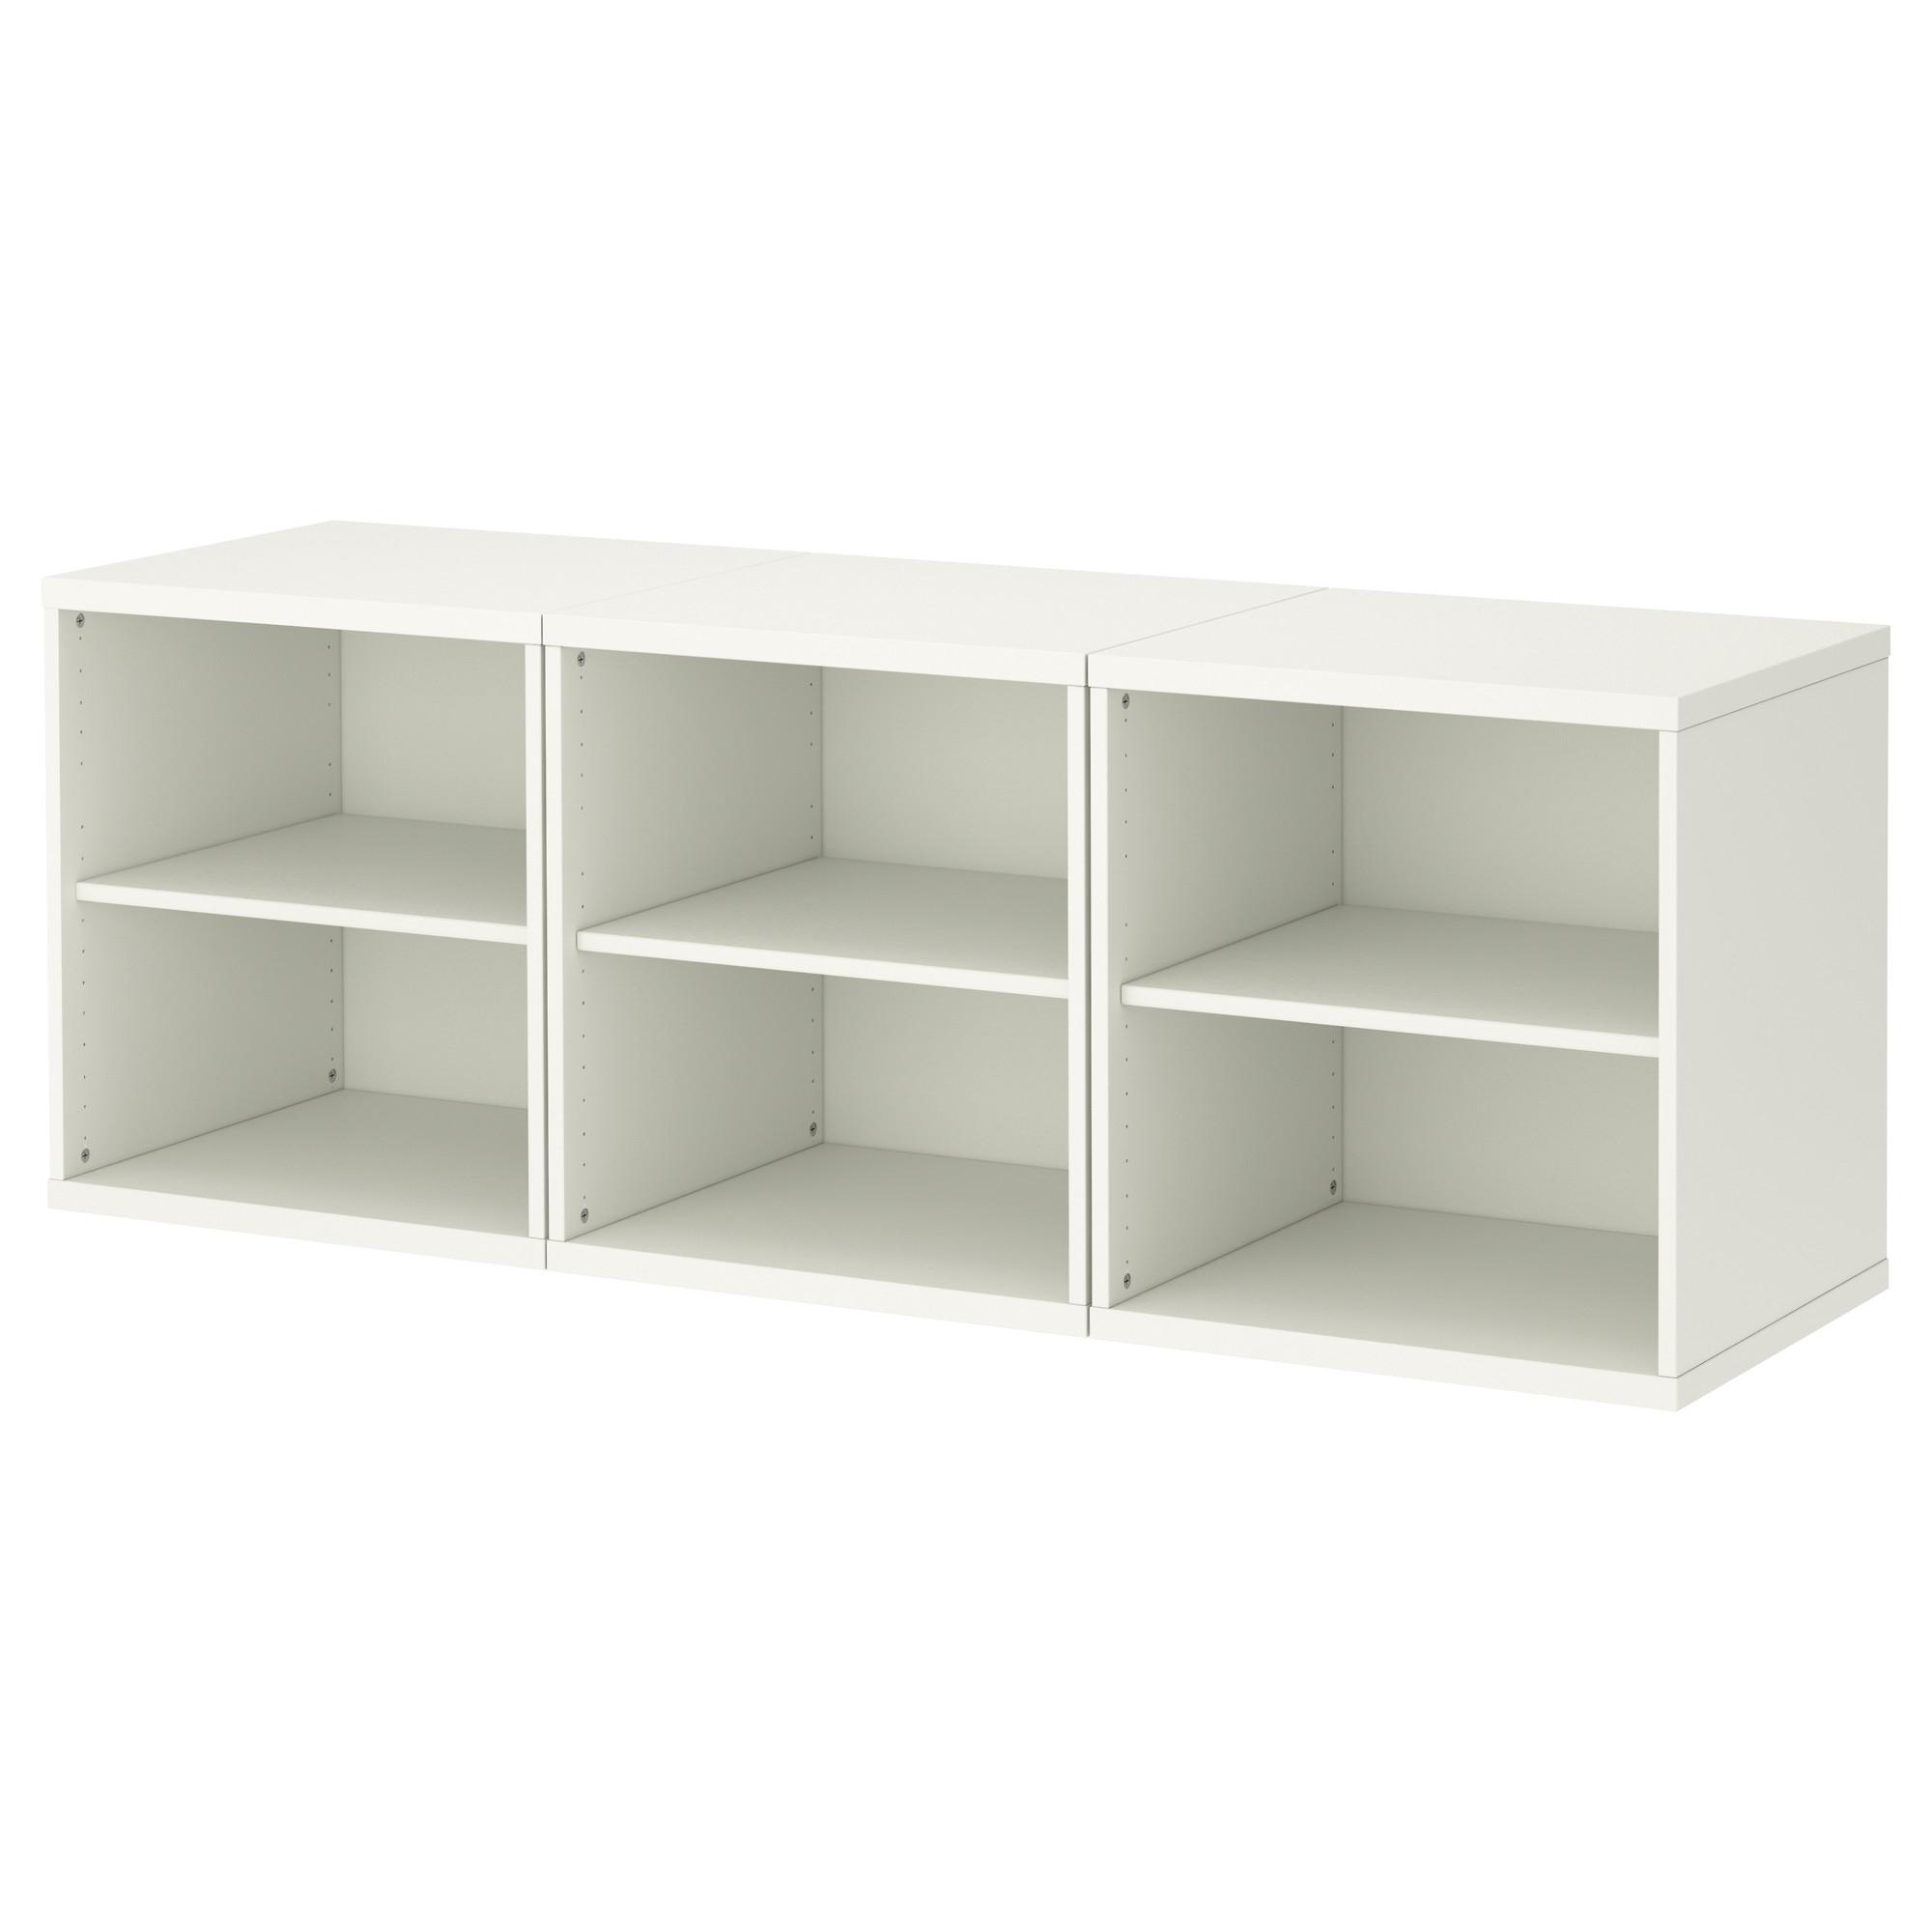 Stuva combinaci n de almacenaje estantes - Ikea muebles modulares ...